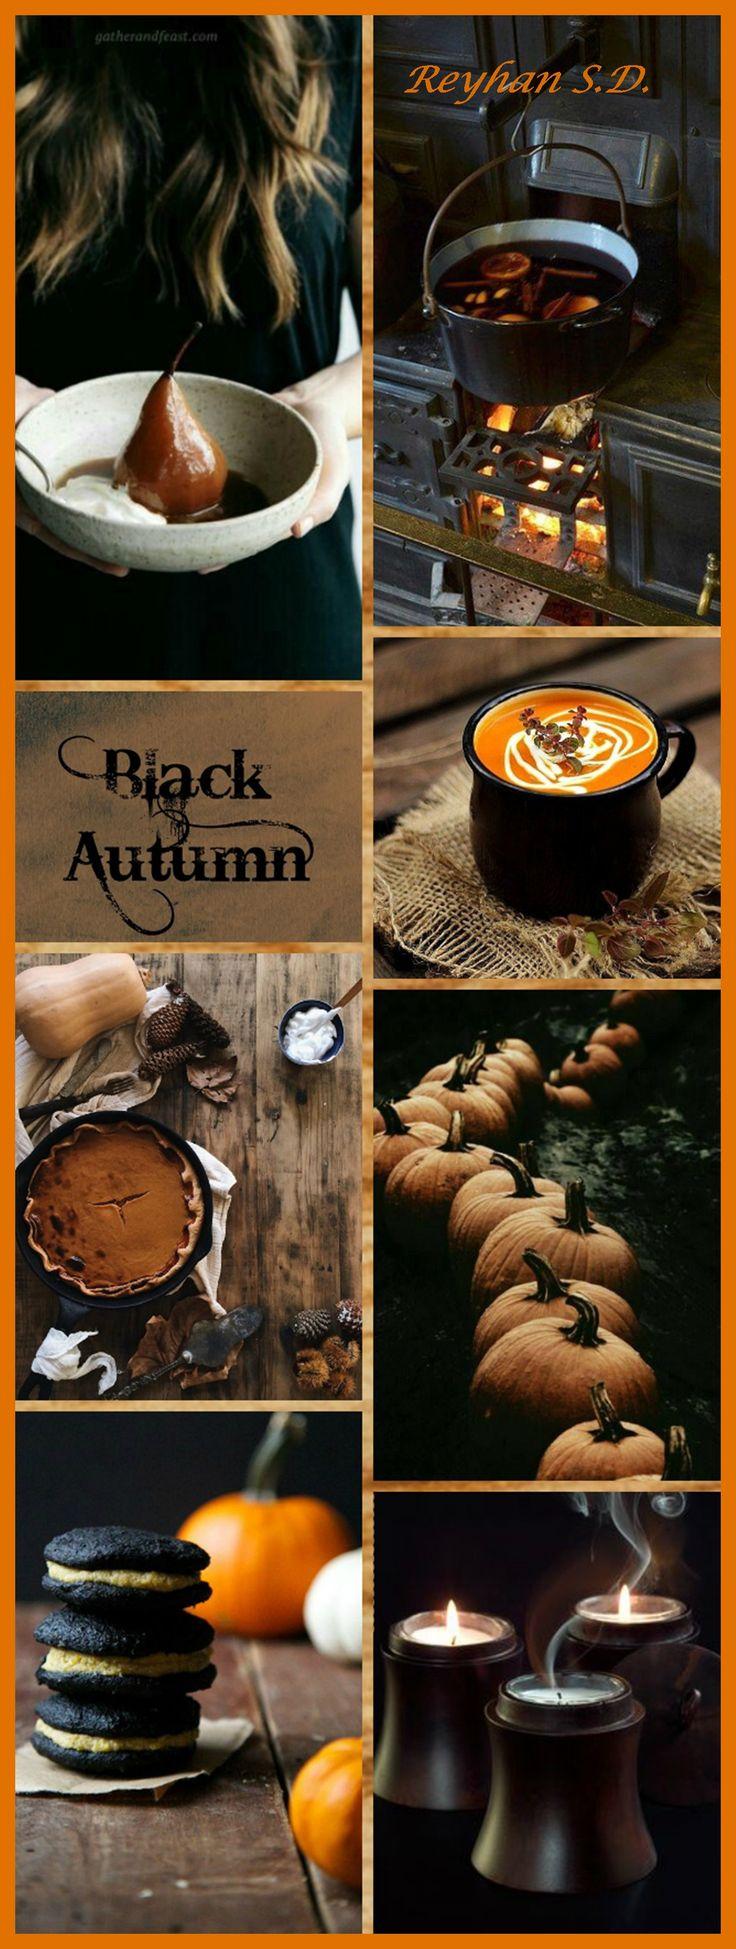 '' Black Autumn '' by Reyhan S.D.